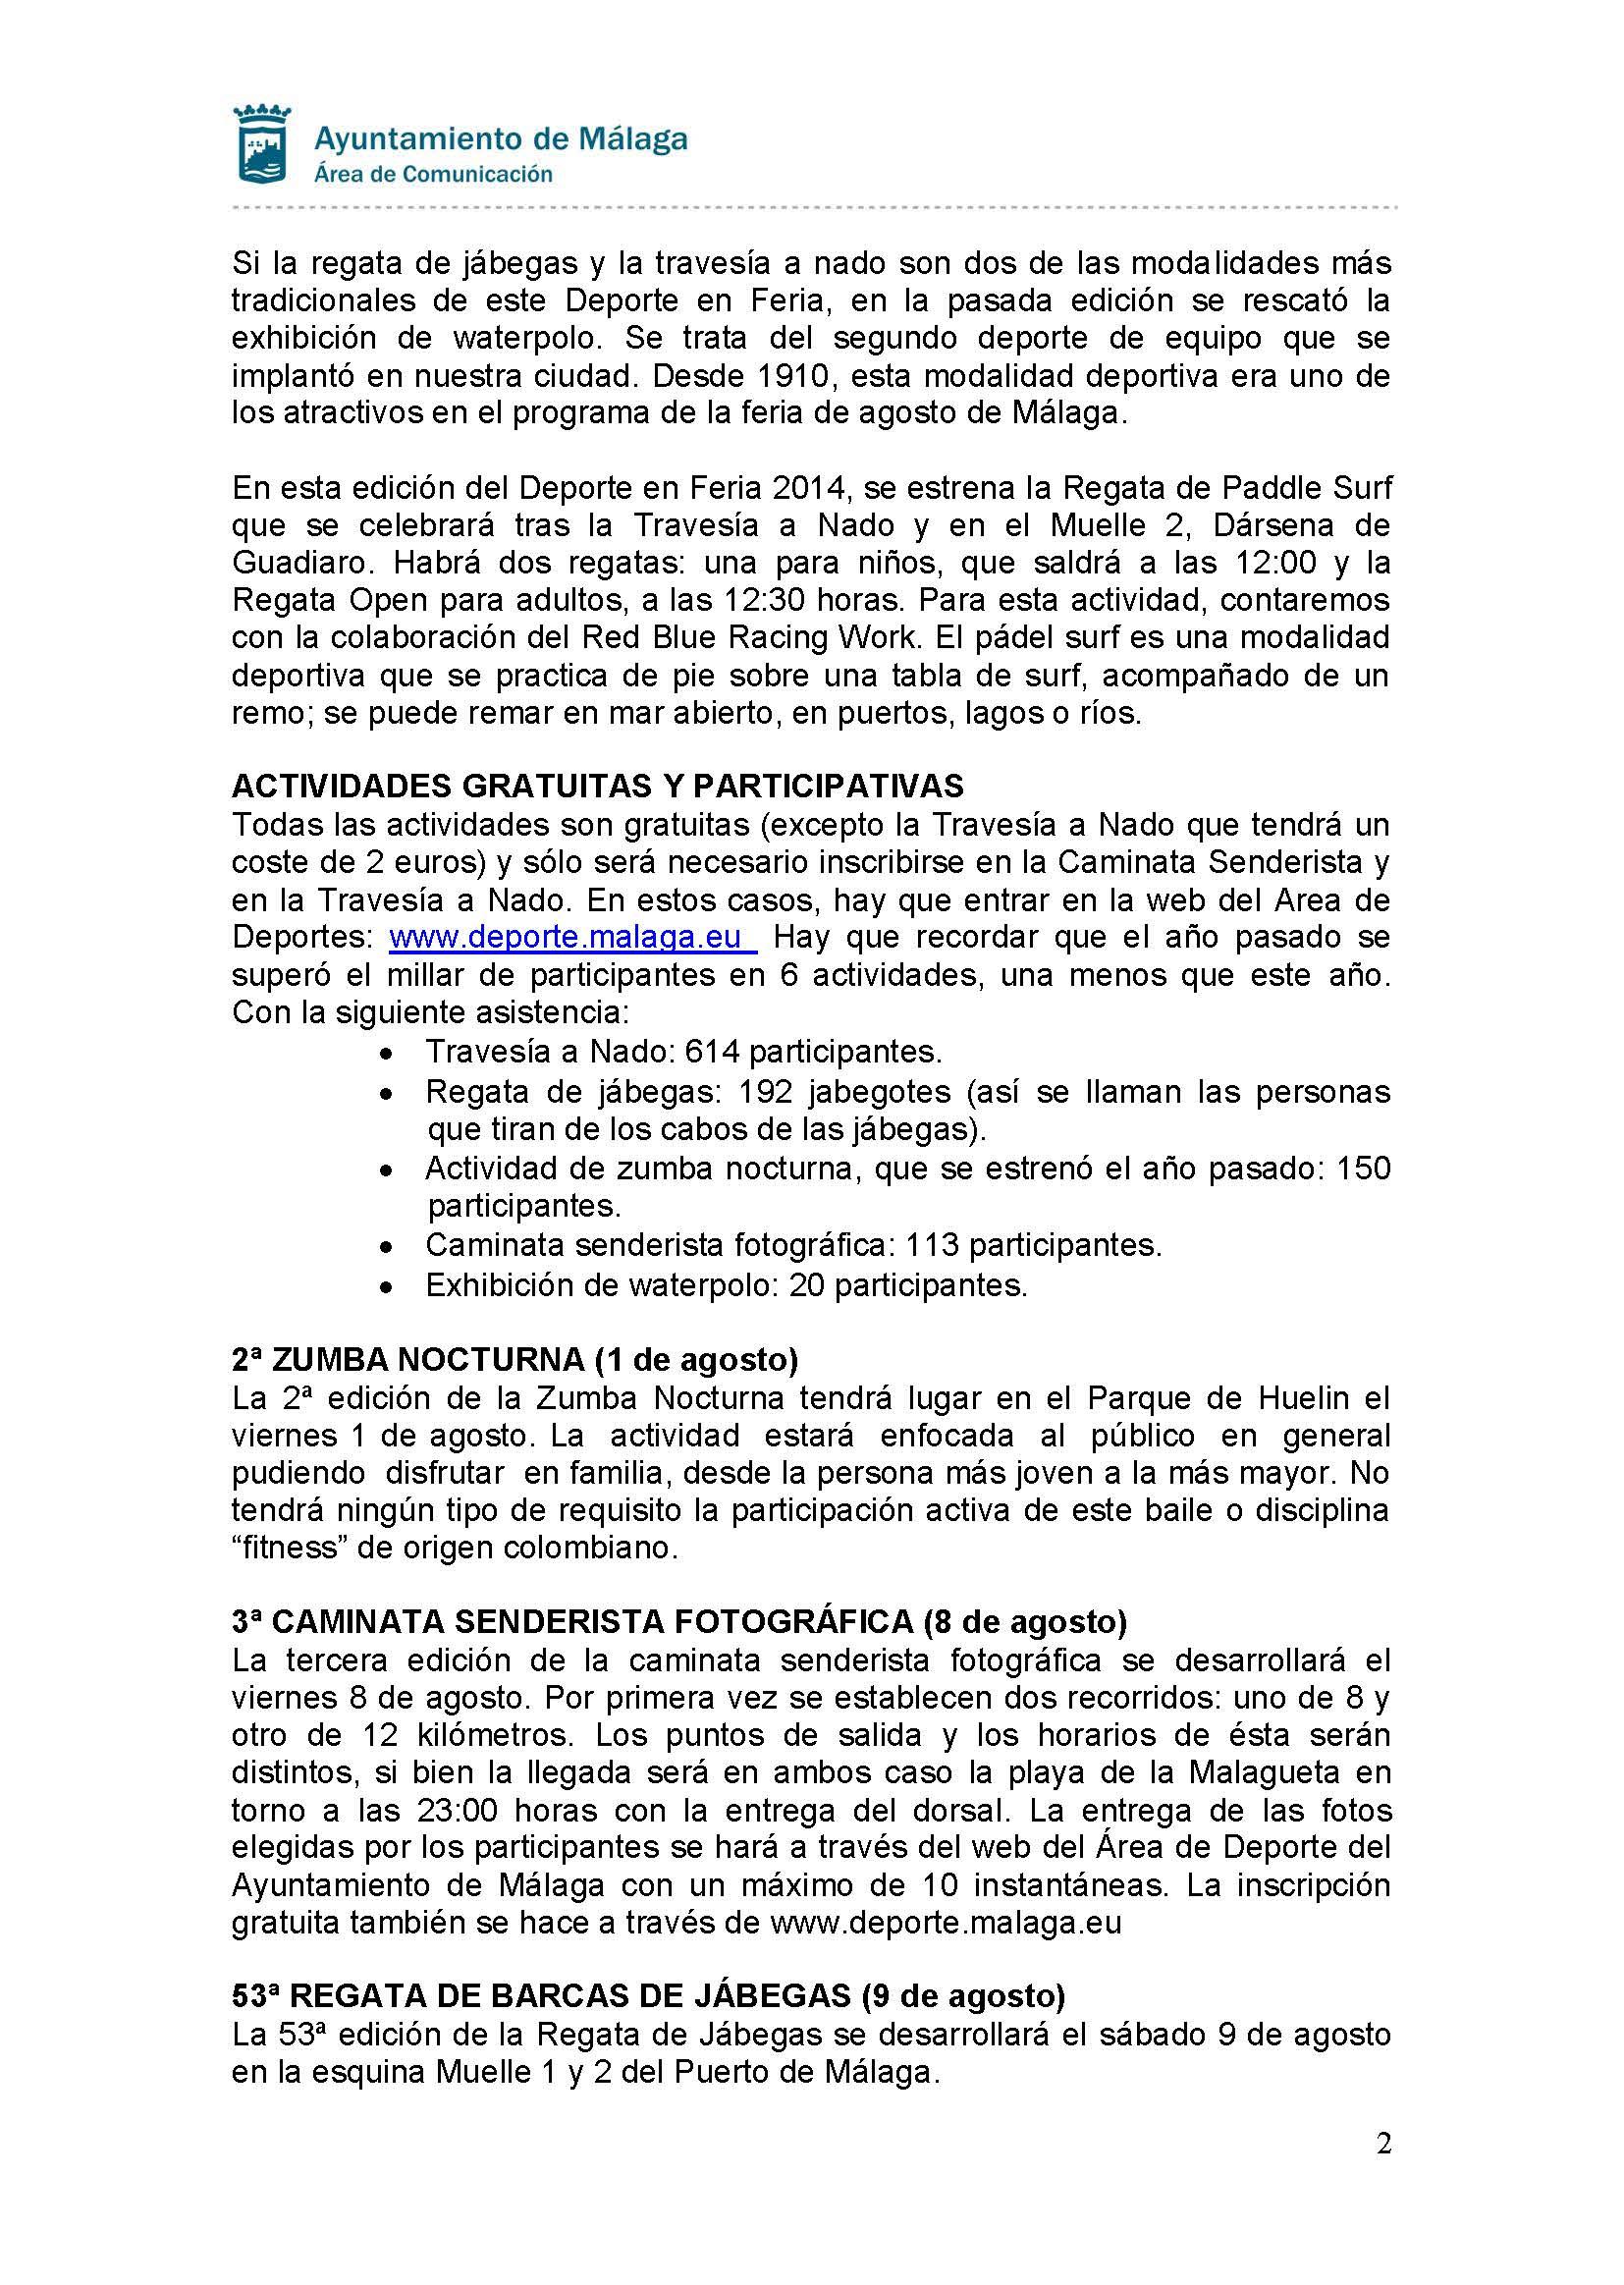 programa-deporte-feria-2014_Page_2